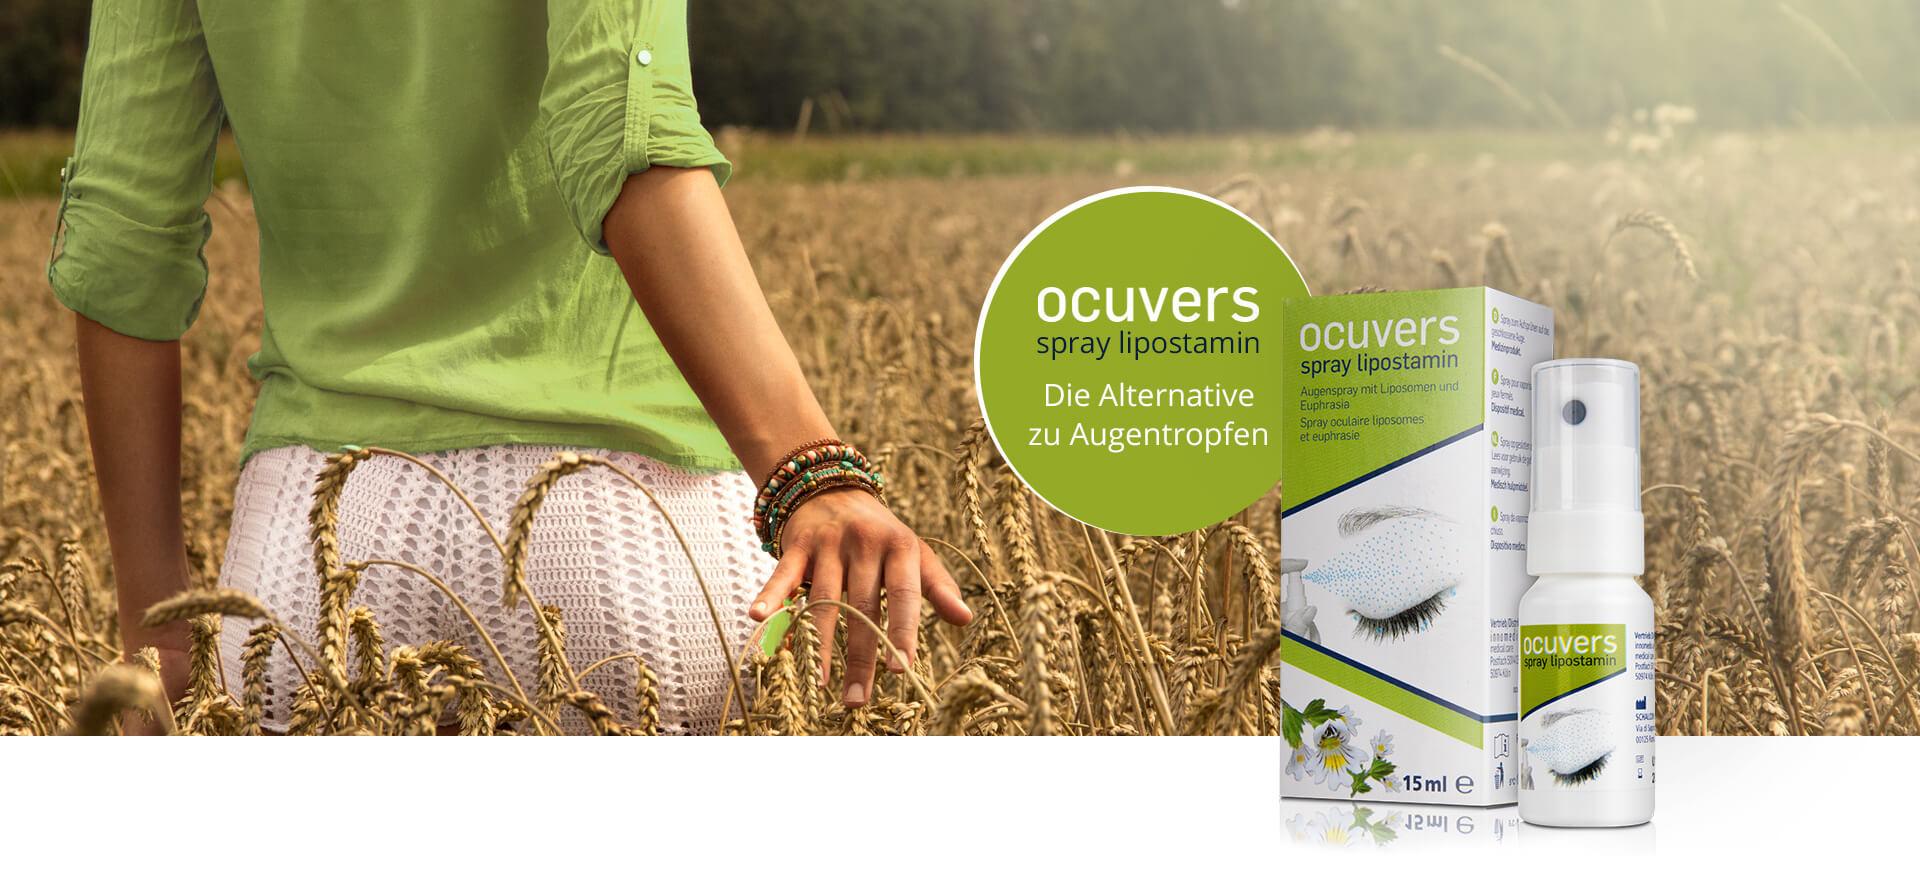 ocuvers-lipostamin-header